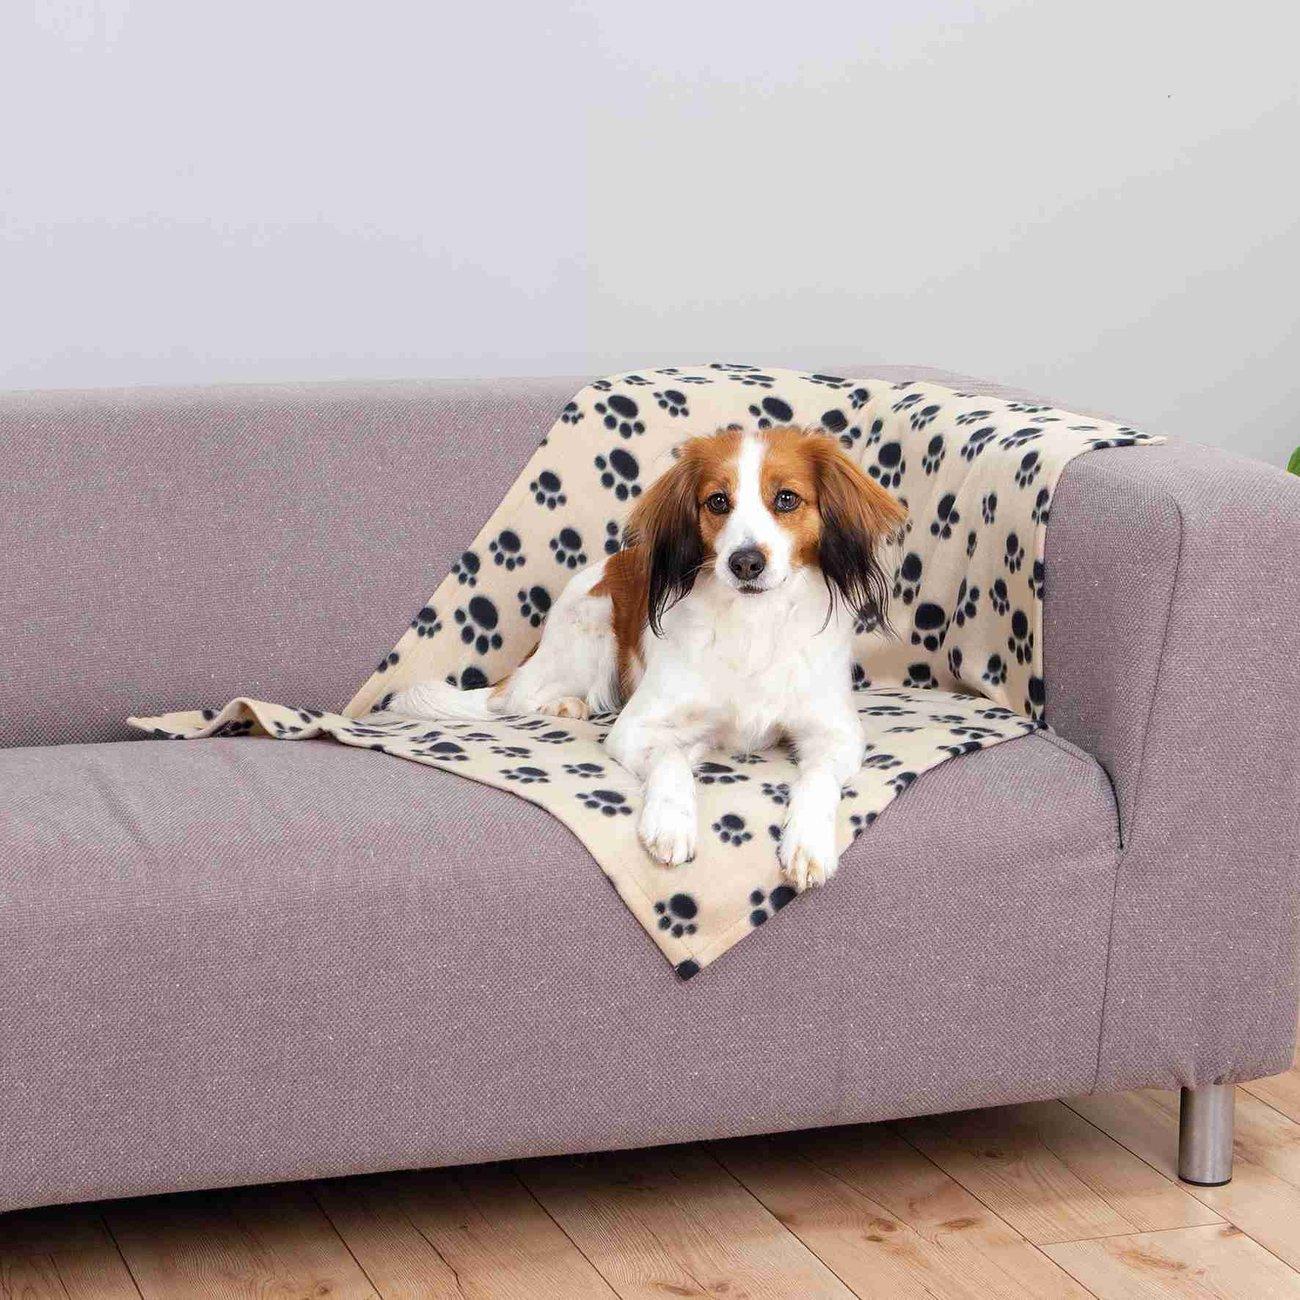 TRIXIE Hundedecke Beany Fleece 37191, Bild 7